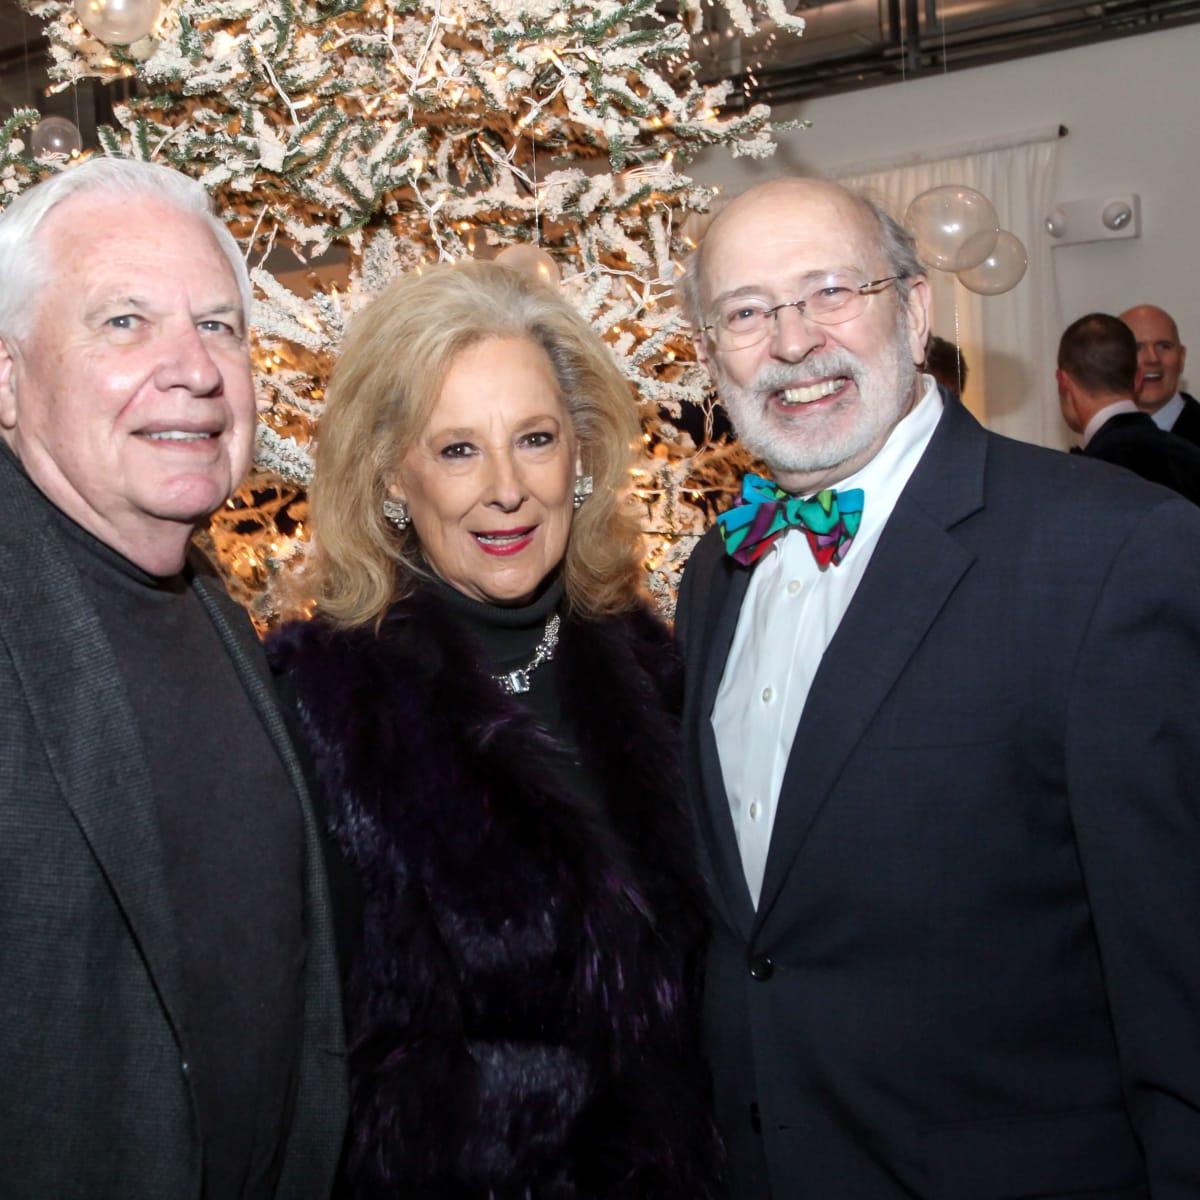 Houston, Legacy Services Holiday Schmooze, Dec 2016, David McKeithan, Mary Ann McKeithan, CC Conner